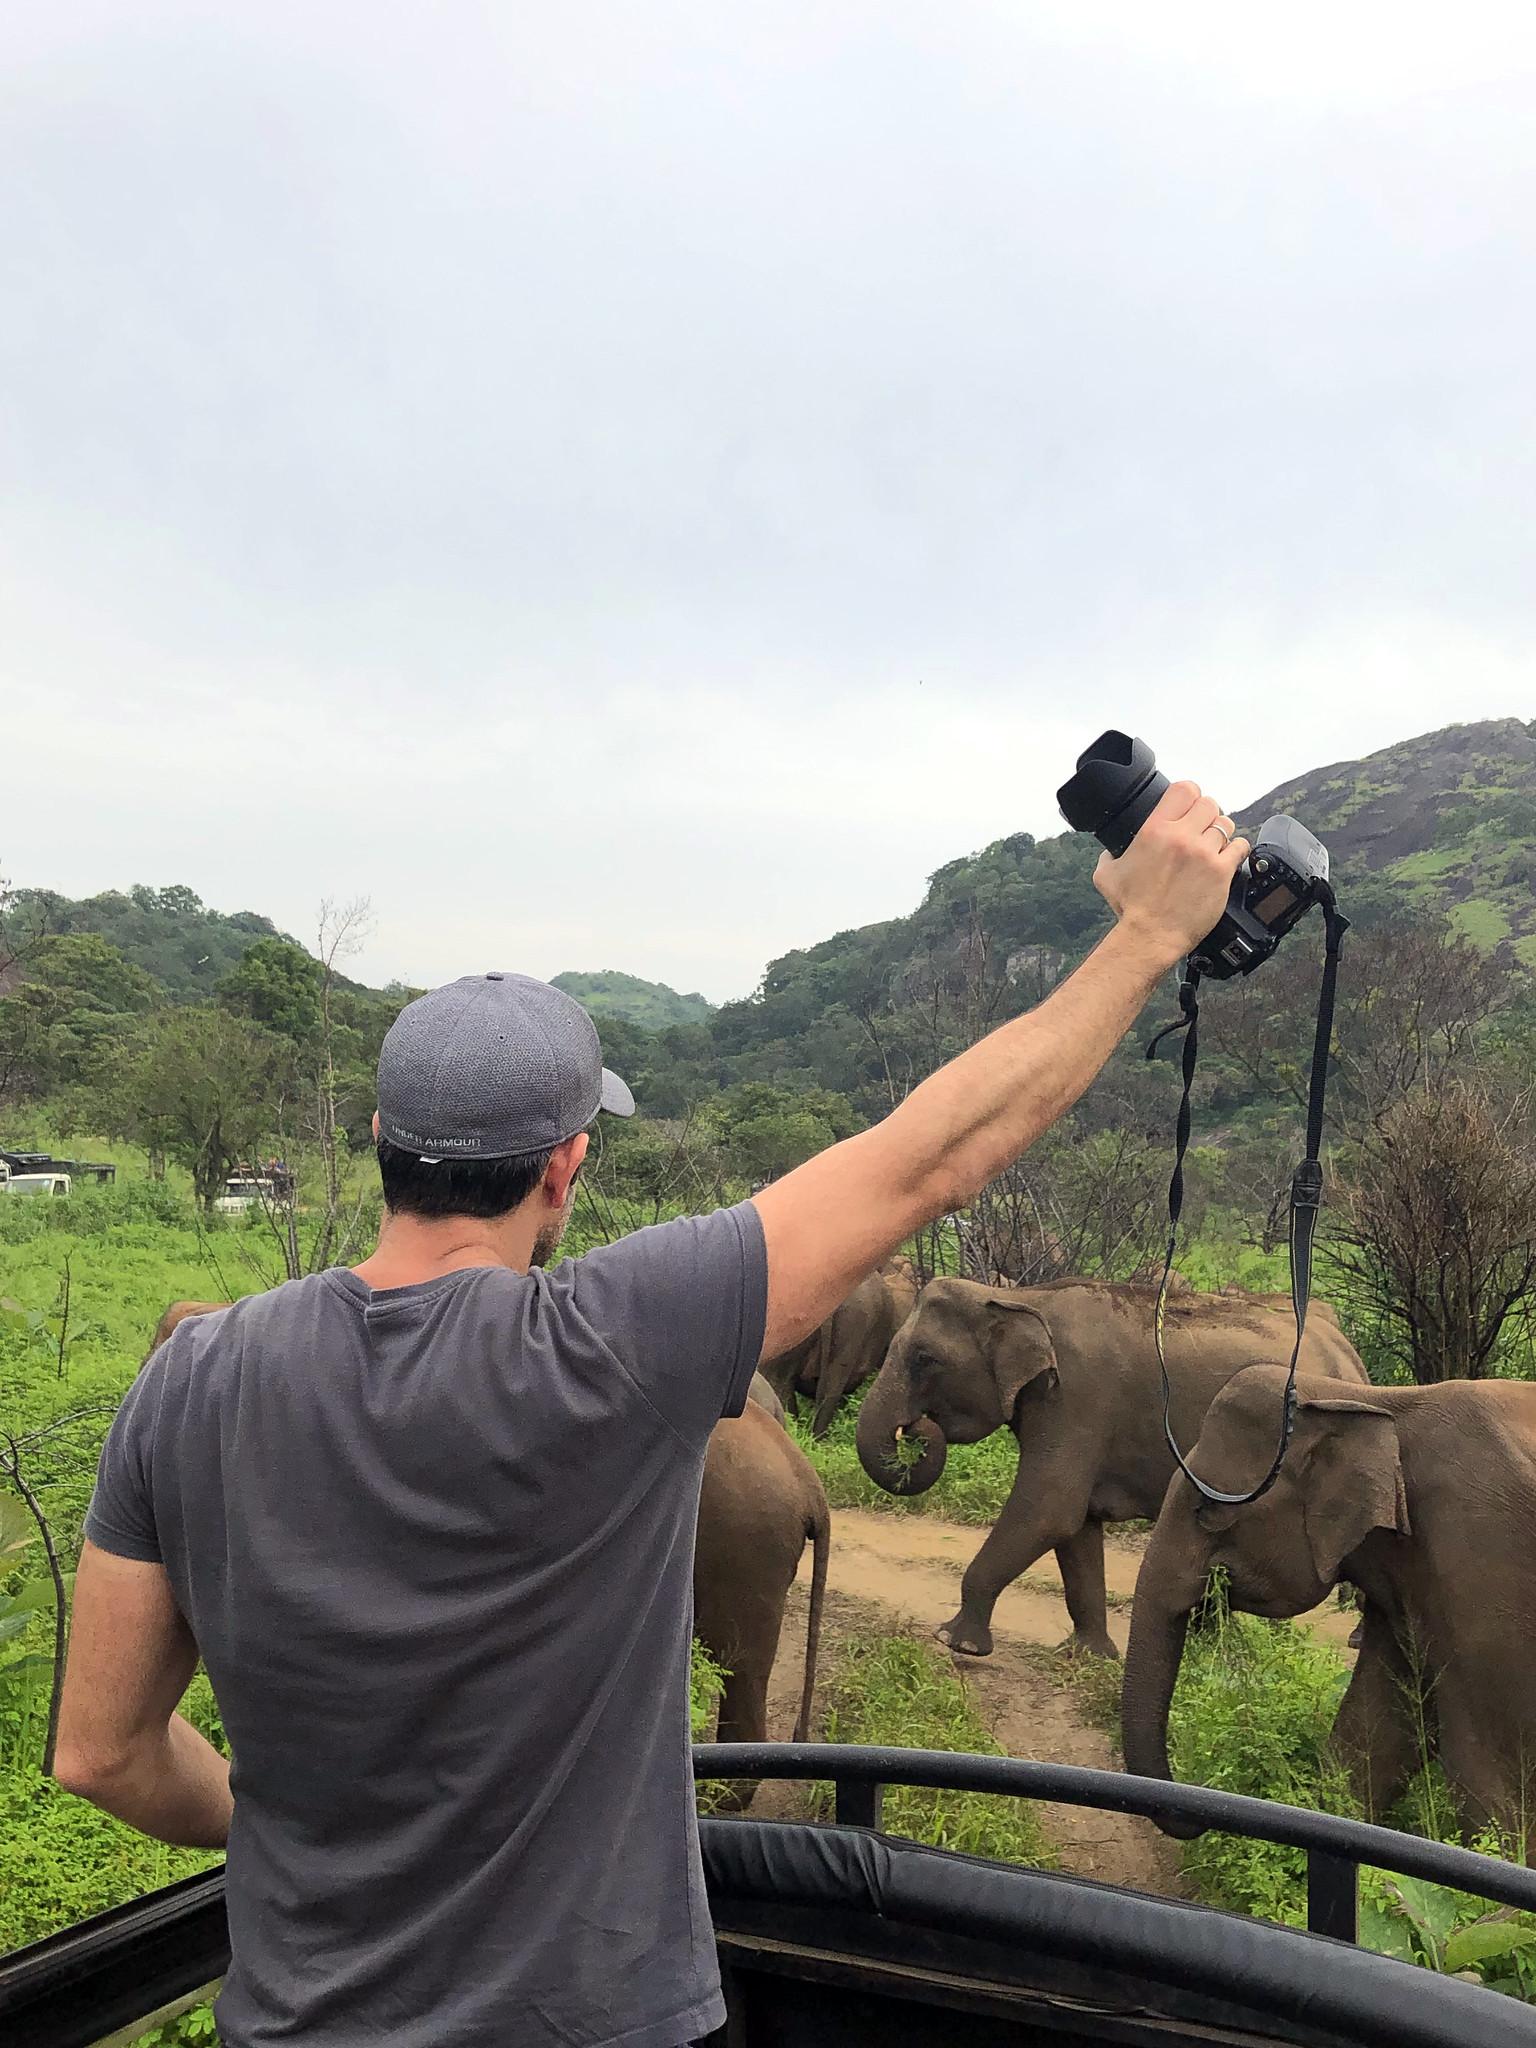 VER ELEFANTES SALVAJES EN SRI LANKA ver elefantes salvajes en sri lanka - 46921986532 b5067631fd k - Ver elefantes salvajes en Sri Lanka